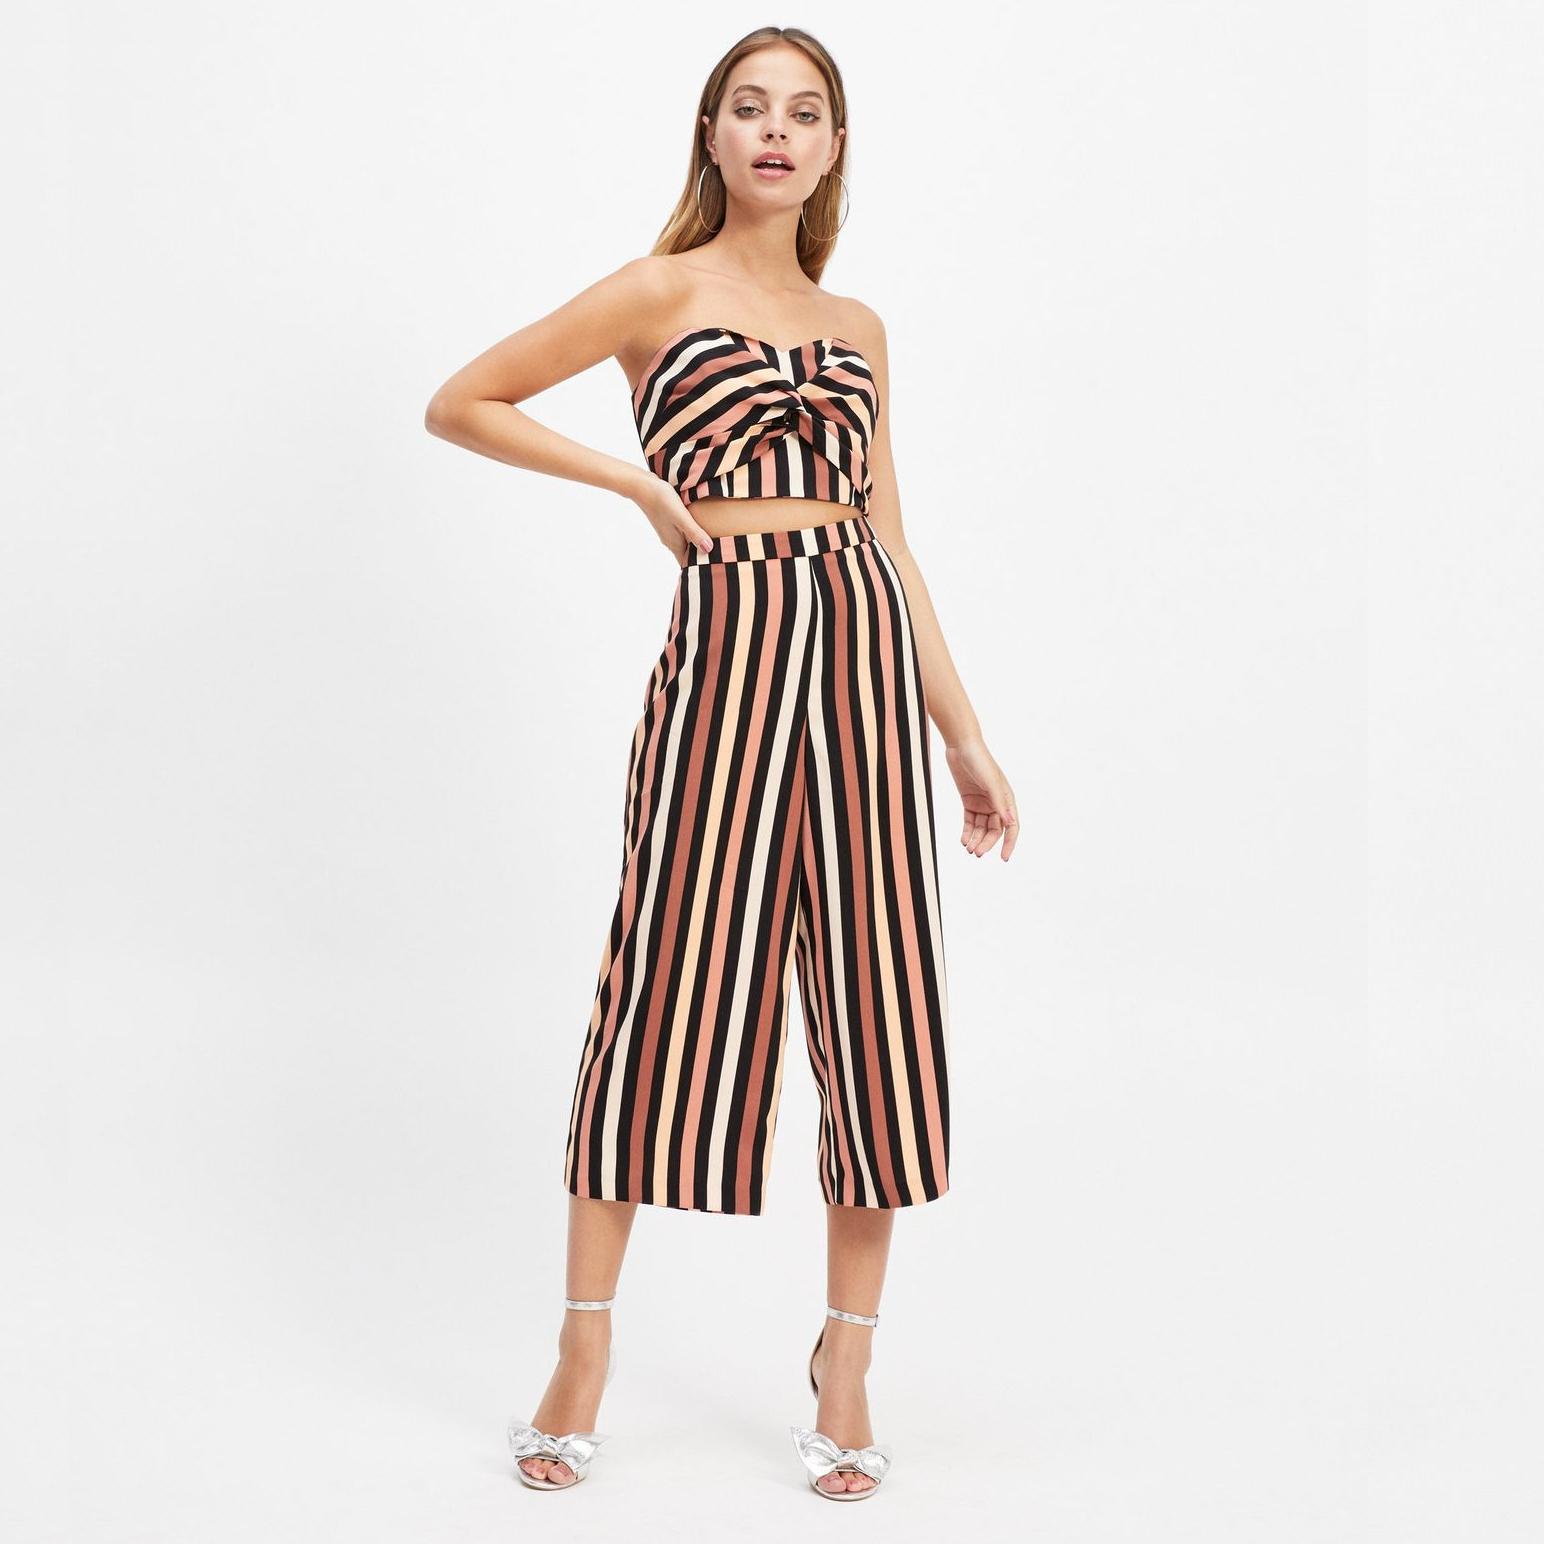 43c33ddbb938 Fashion for Women Deals ⇒ Cheap price, best Sale in UK - hotukdeals